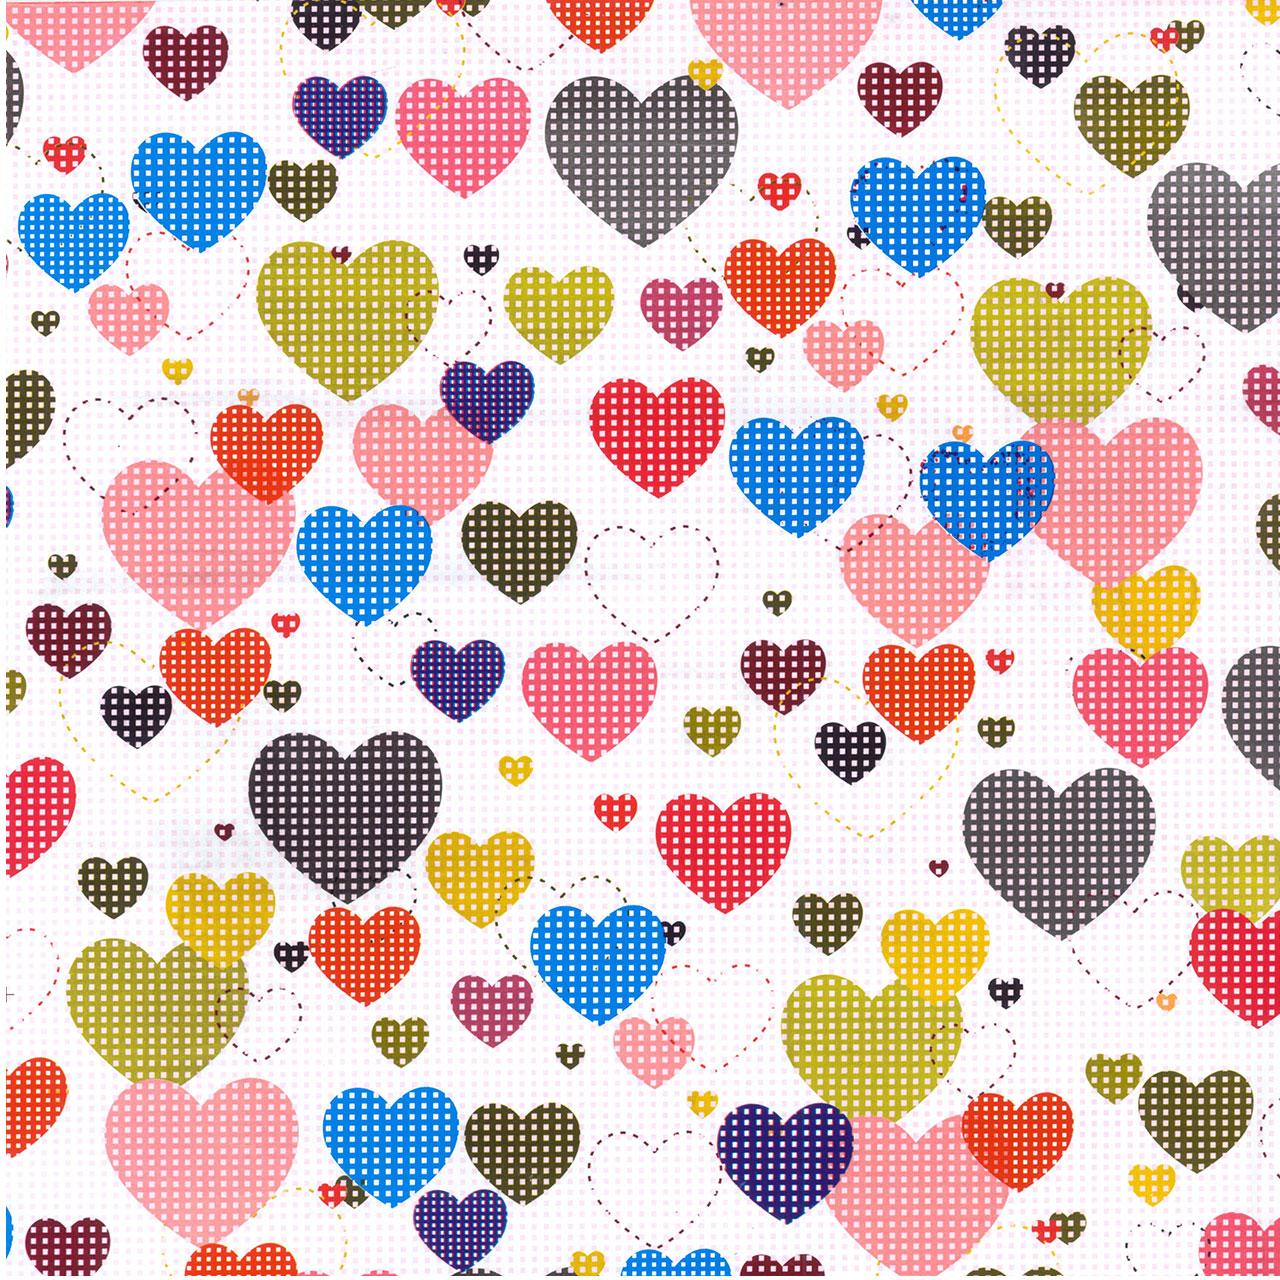 کاغذ کادو گلاسه طرح قلب رنگی کد 0116 بسته 4 عددی